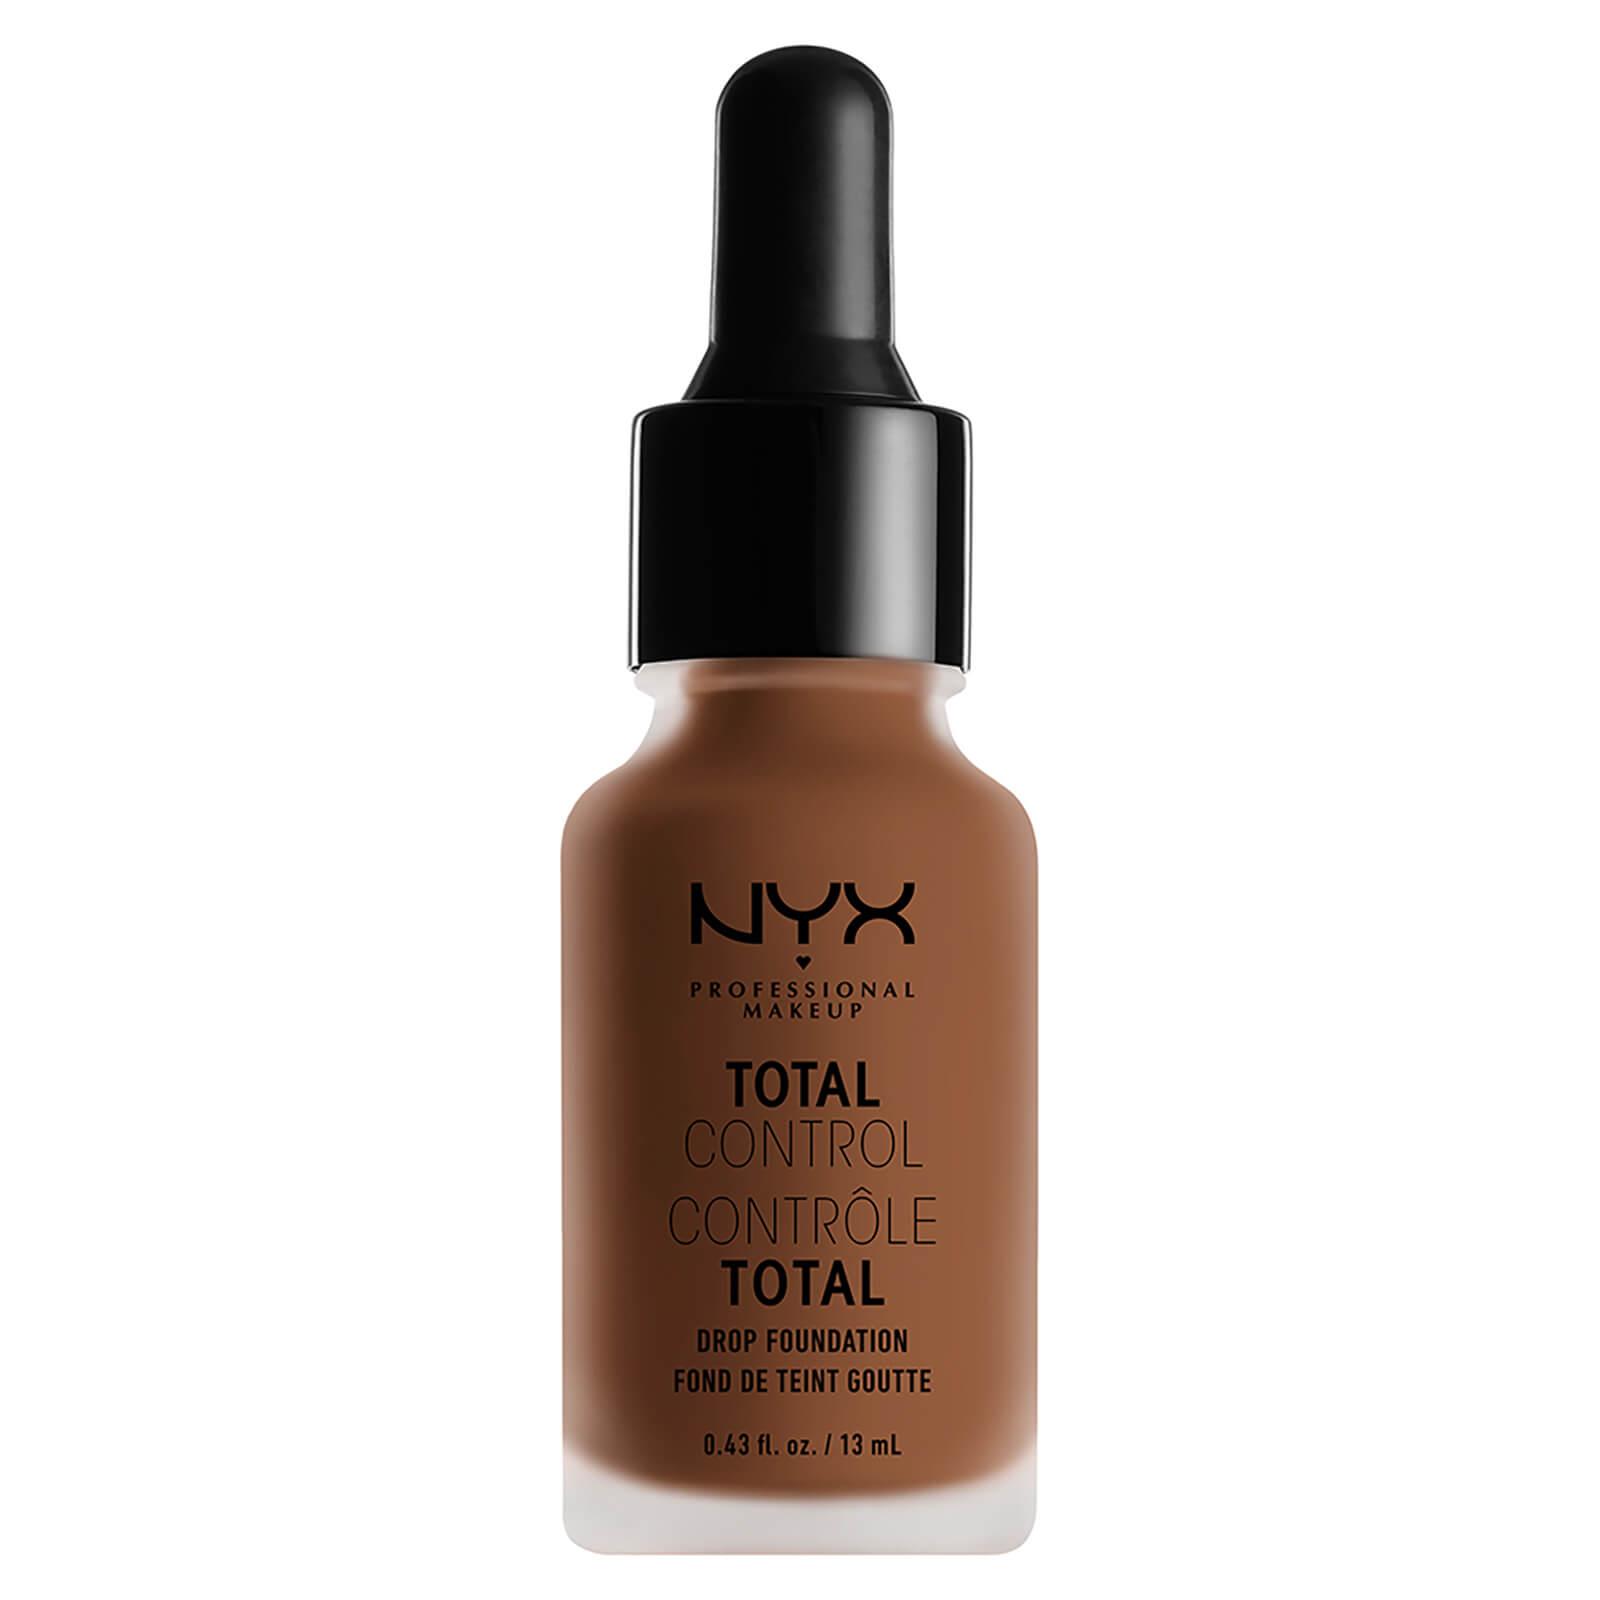 nyx professional makeup total control drop foundation (various shades) - cappuccino